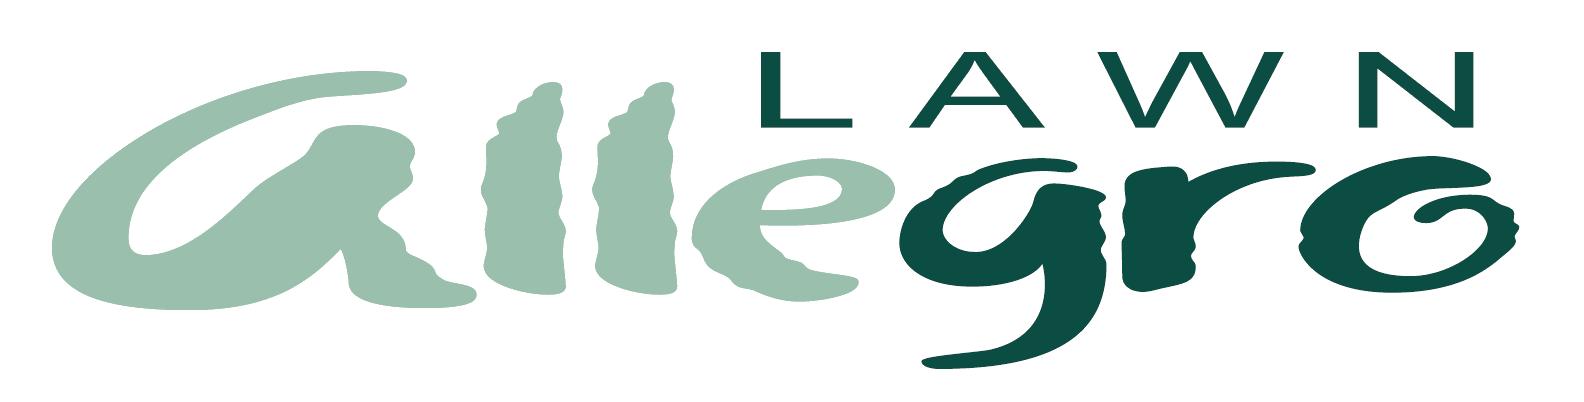 LandTech Landscaping